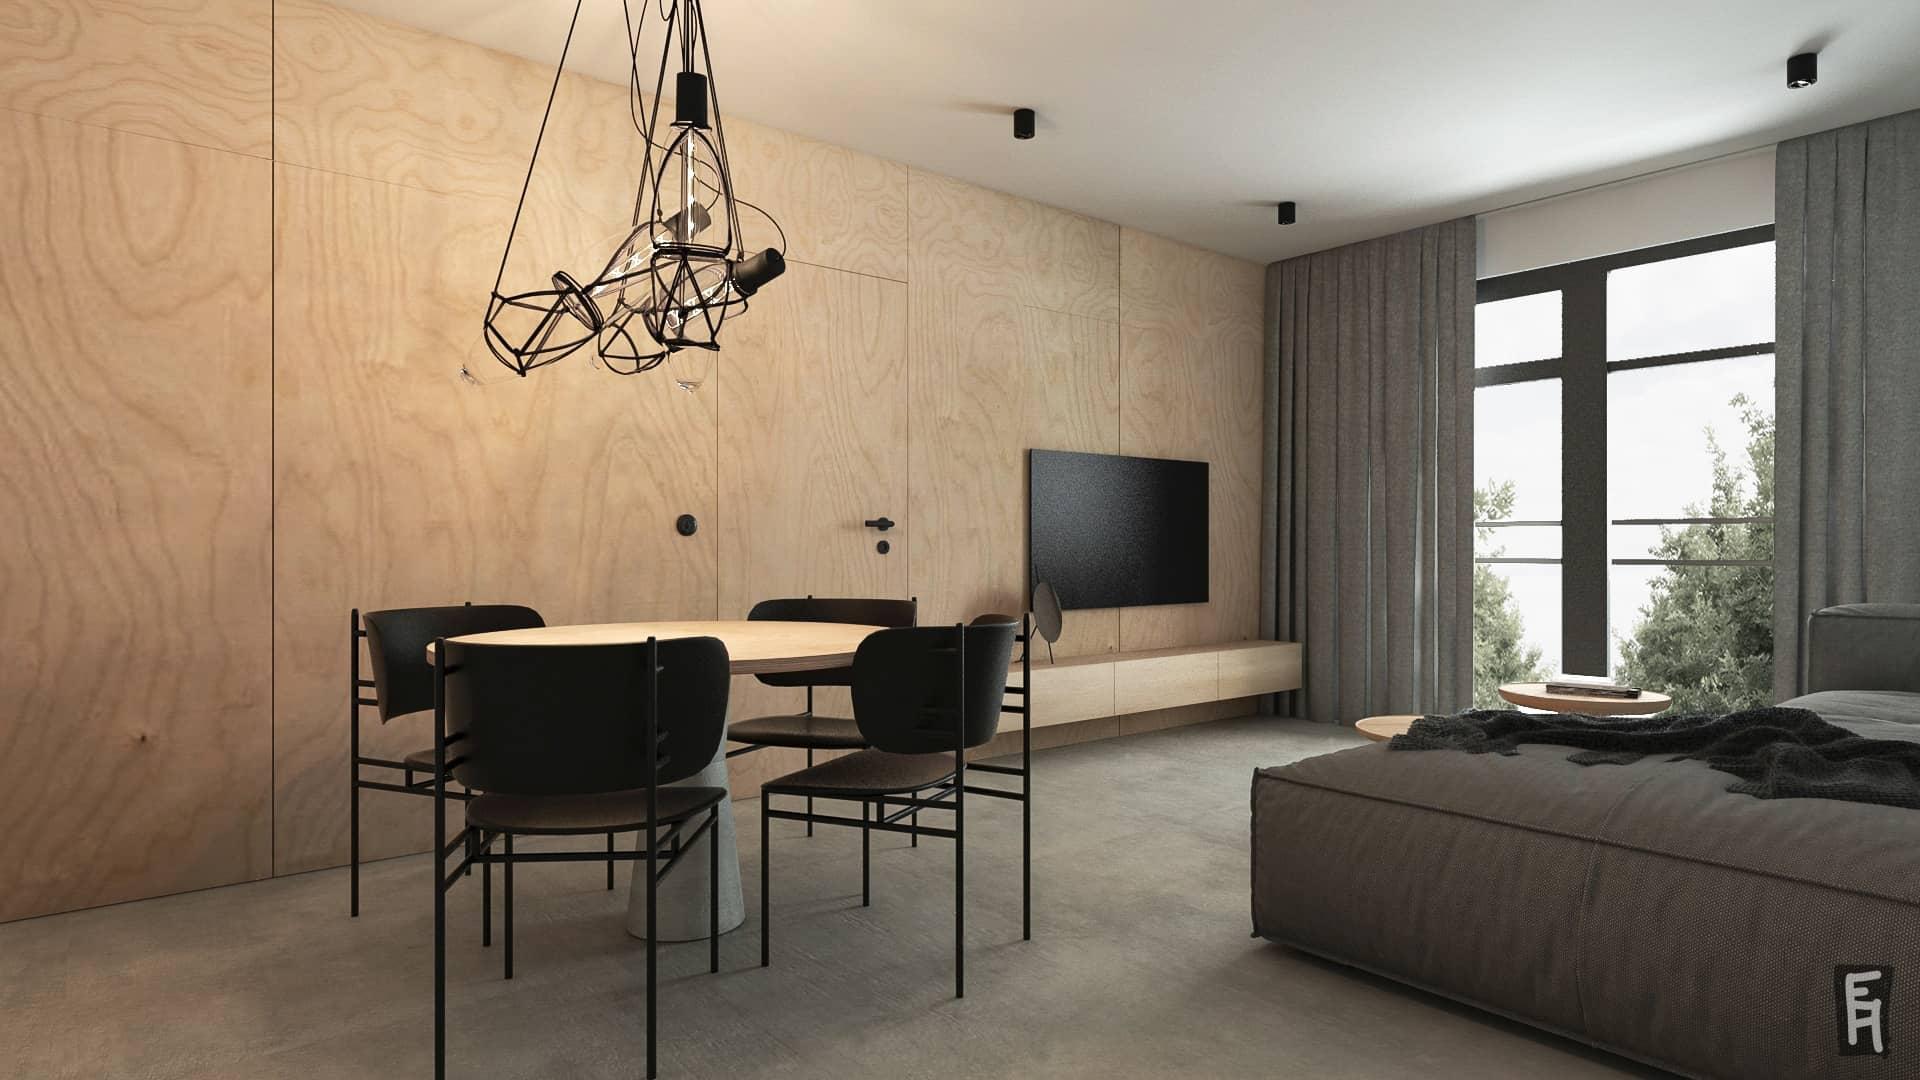 Centrum Křižíkova Free Architects rozhovor interiér